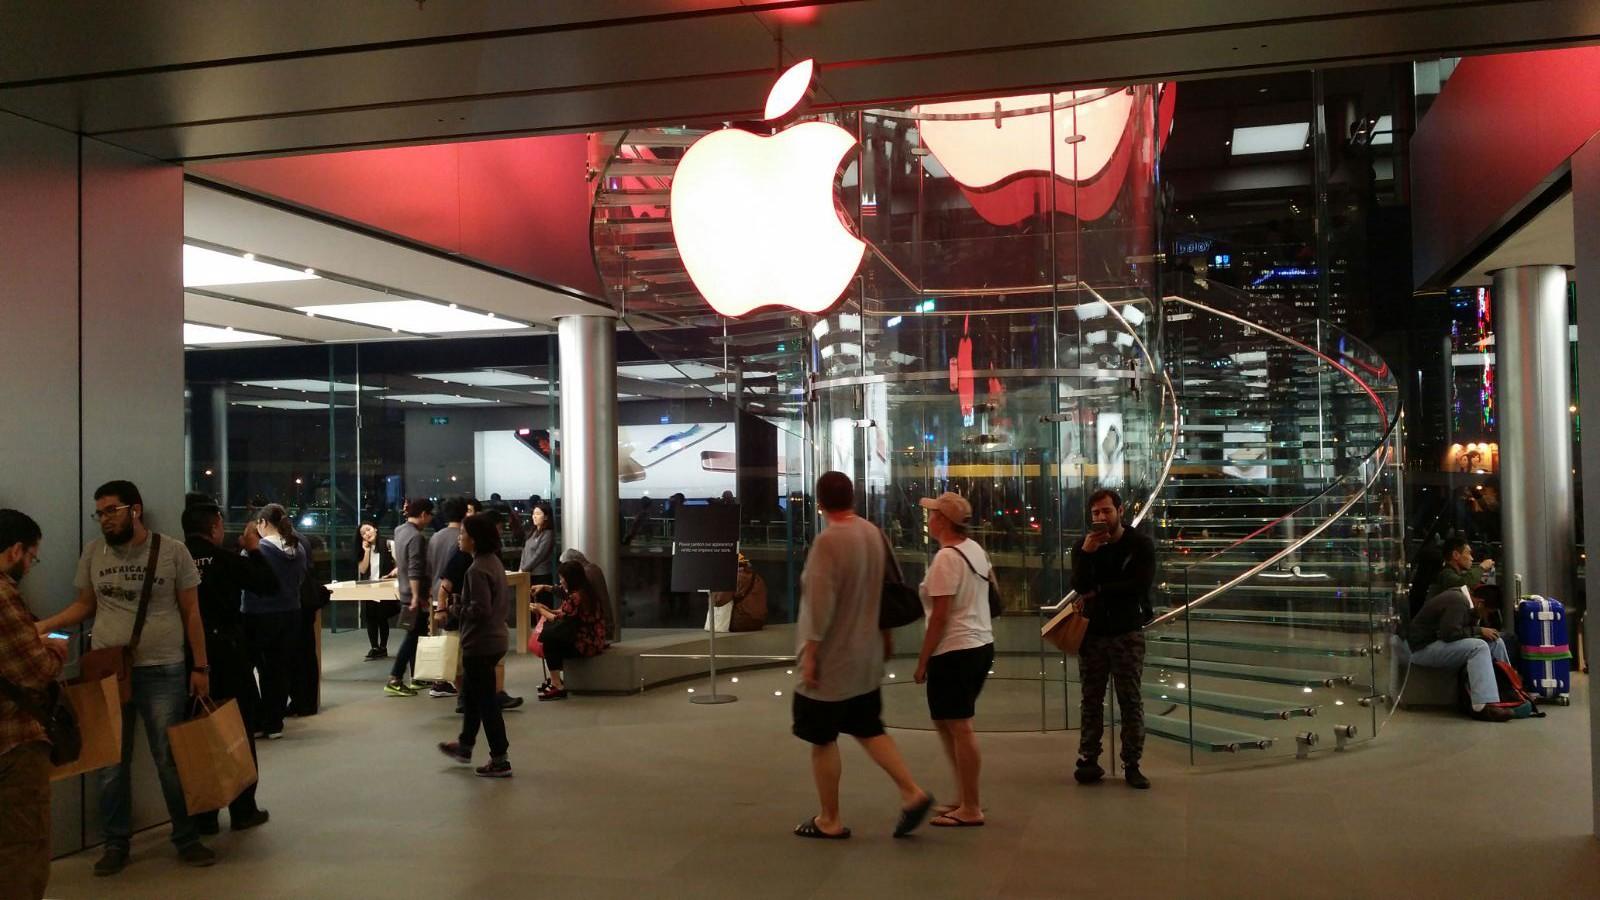 Apple Store Logo 變紅色 | 只此一日合照要趁早